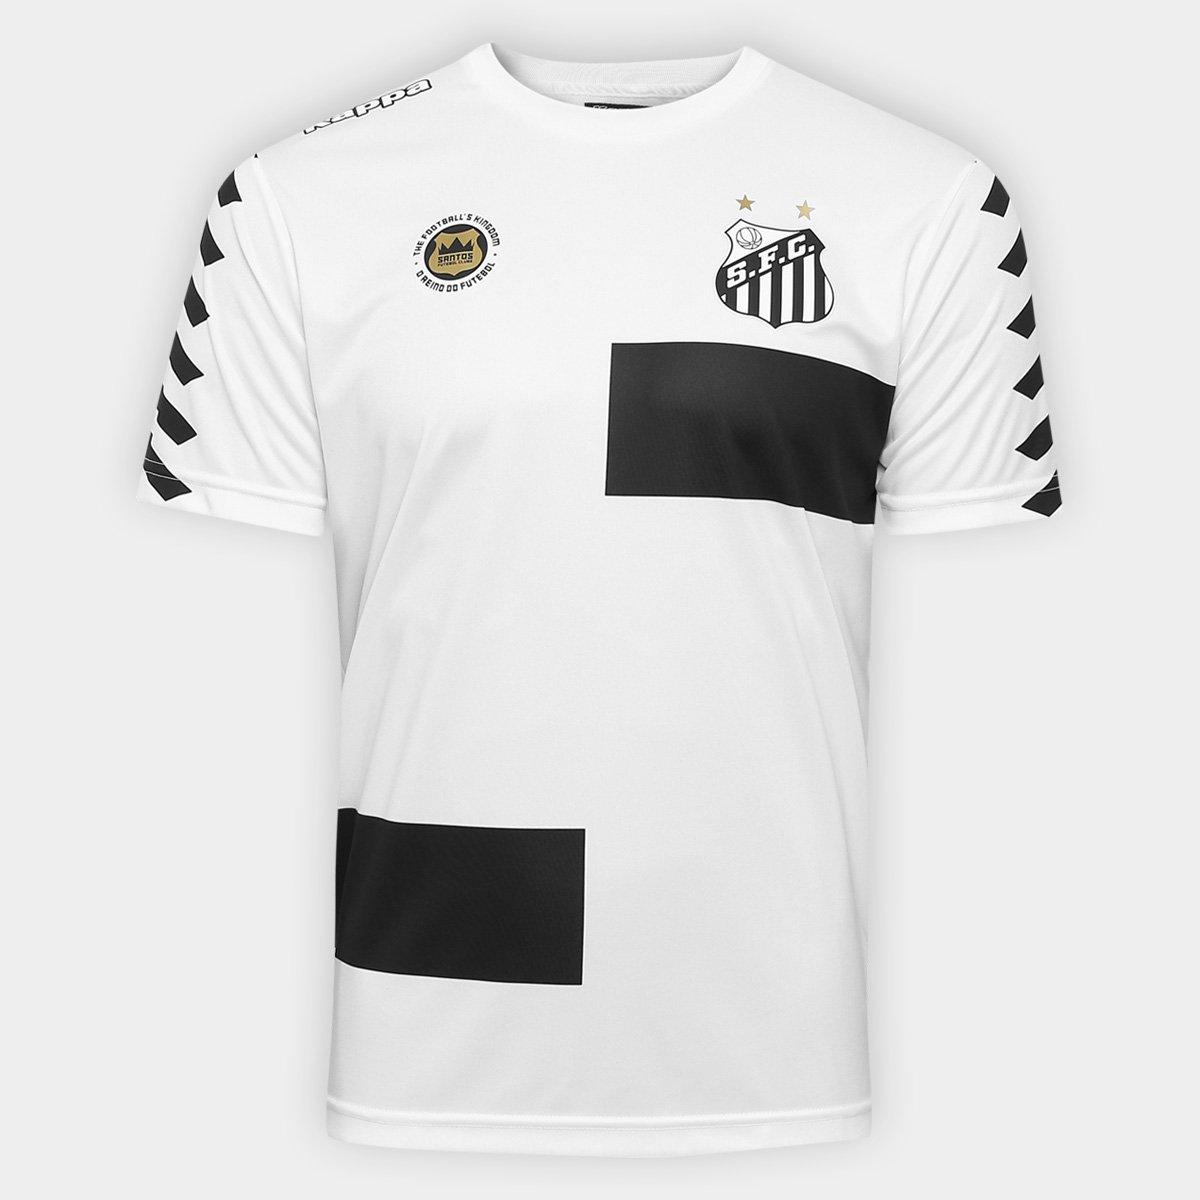 8cb917abdb Camisa Santos Treino I 17 18 s nº - Torcedor Kappa Masculina - Compre Agora